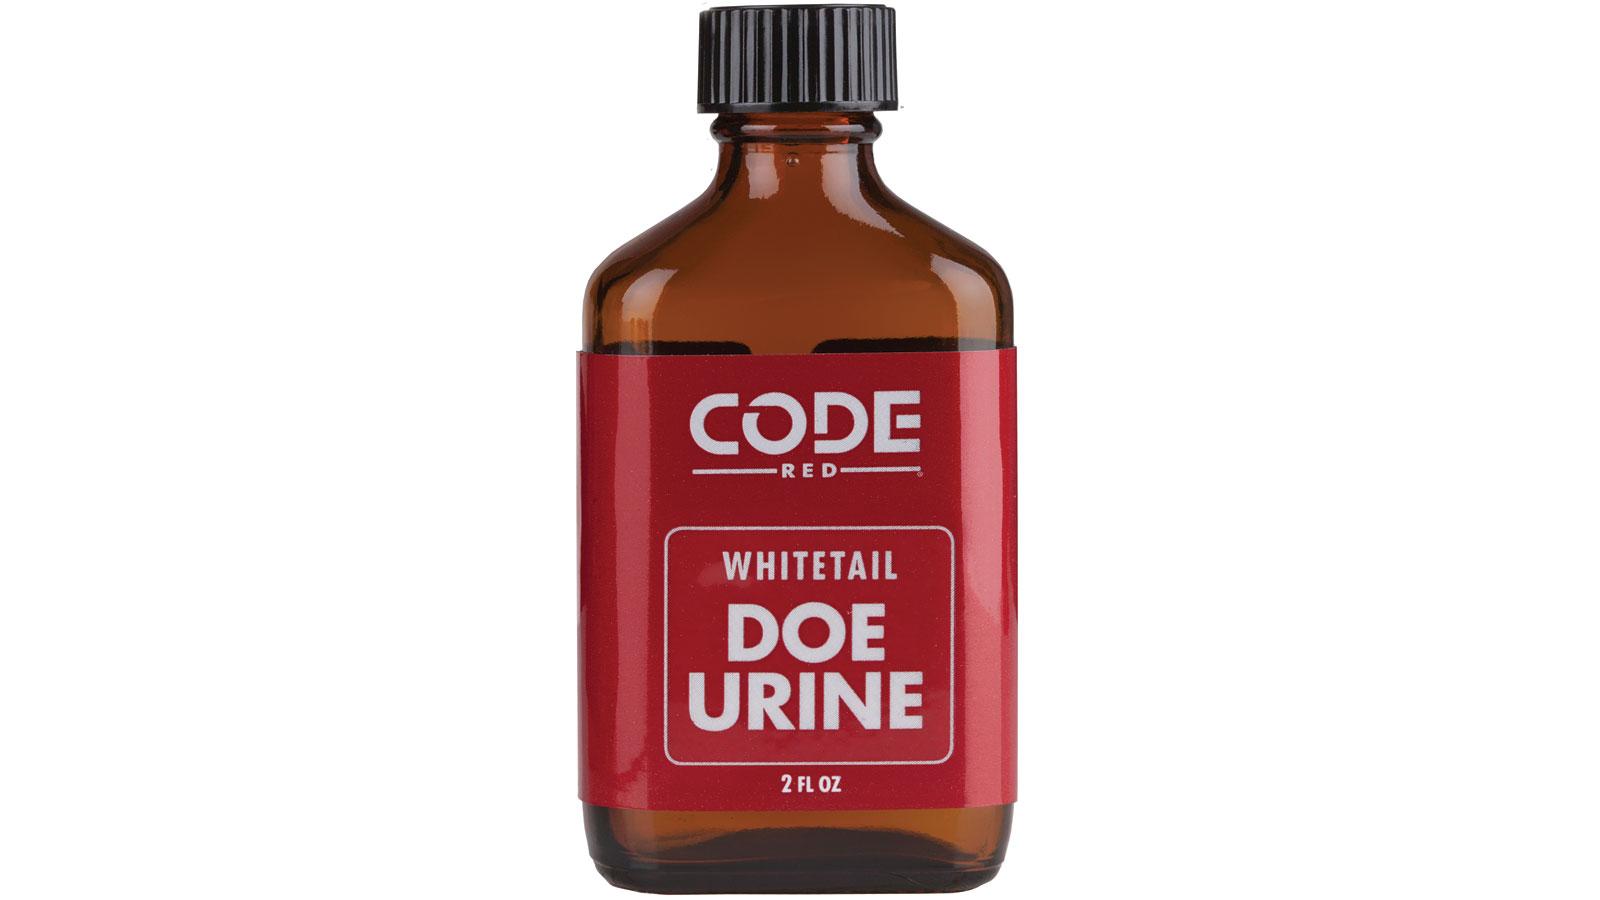 Code Blue Scents CR DOE URINE